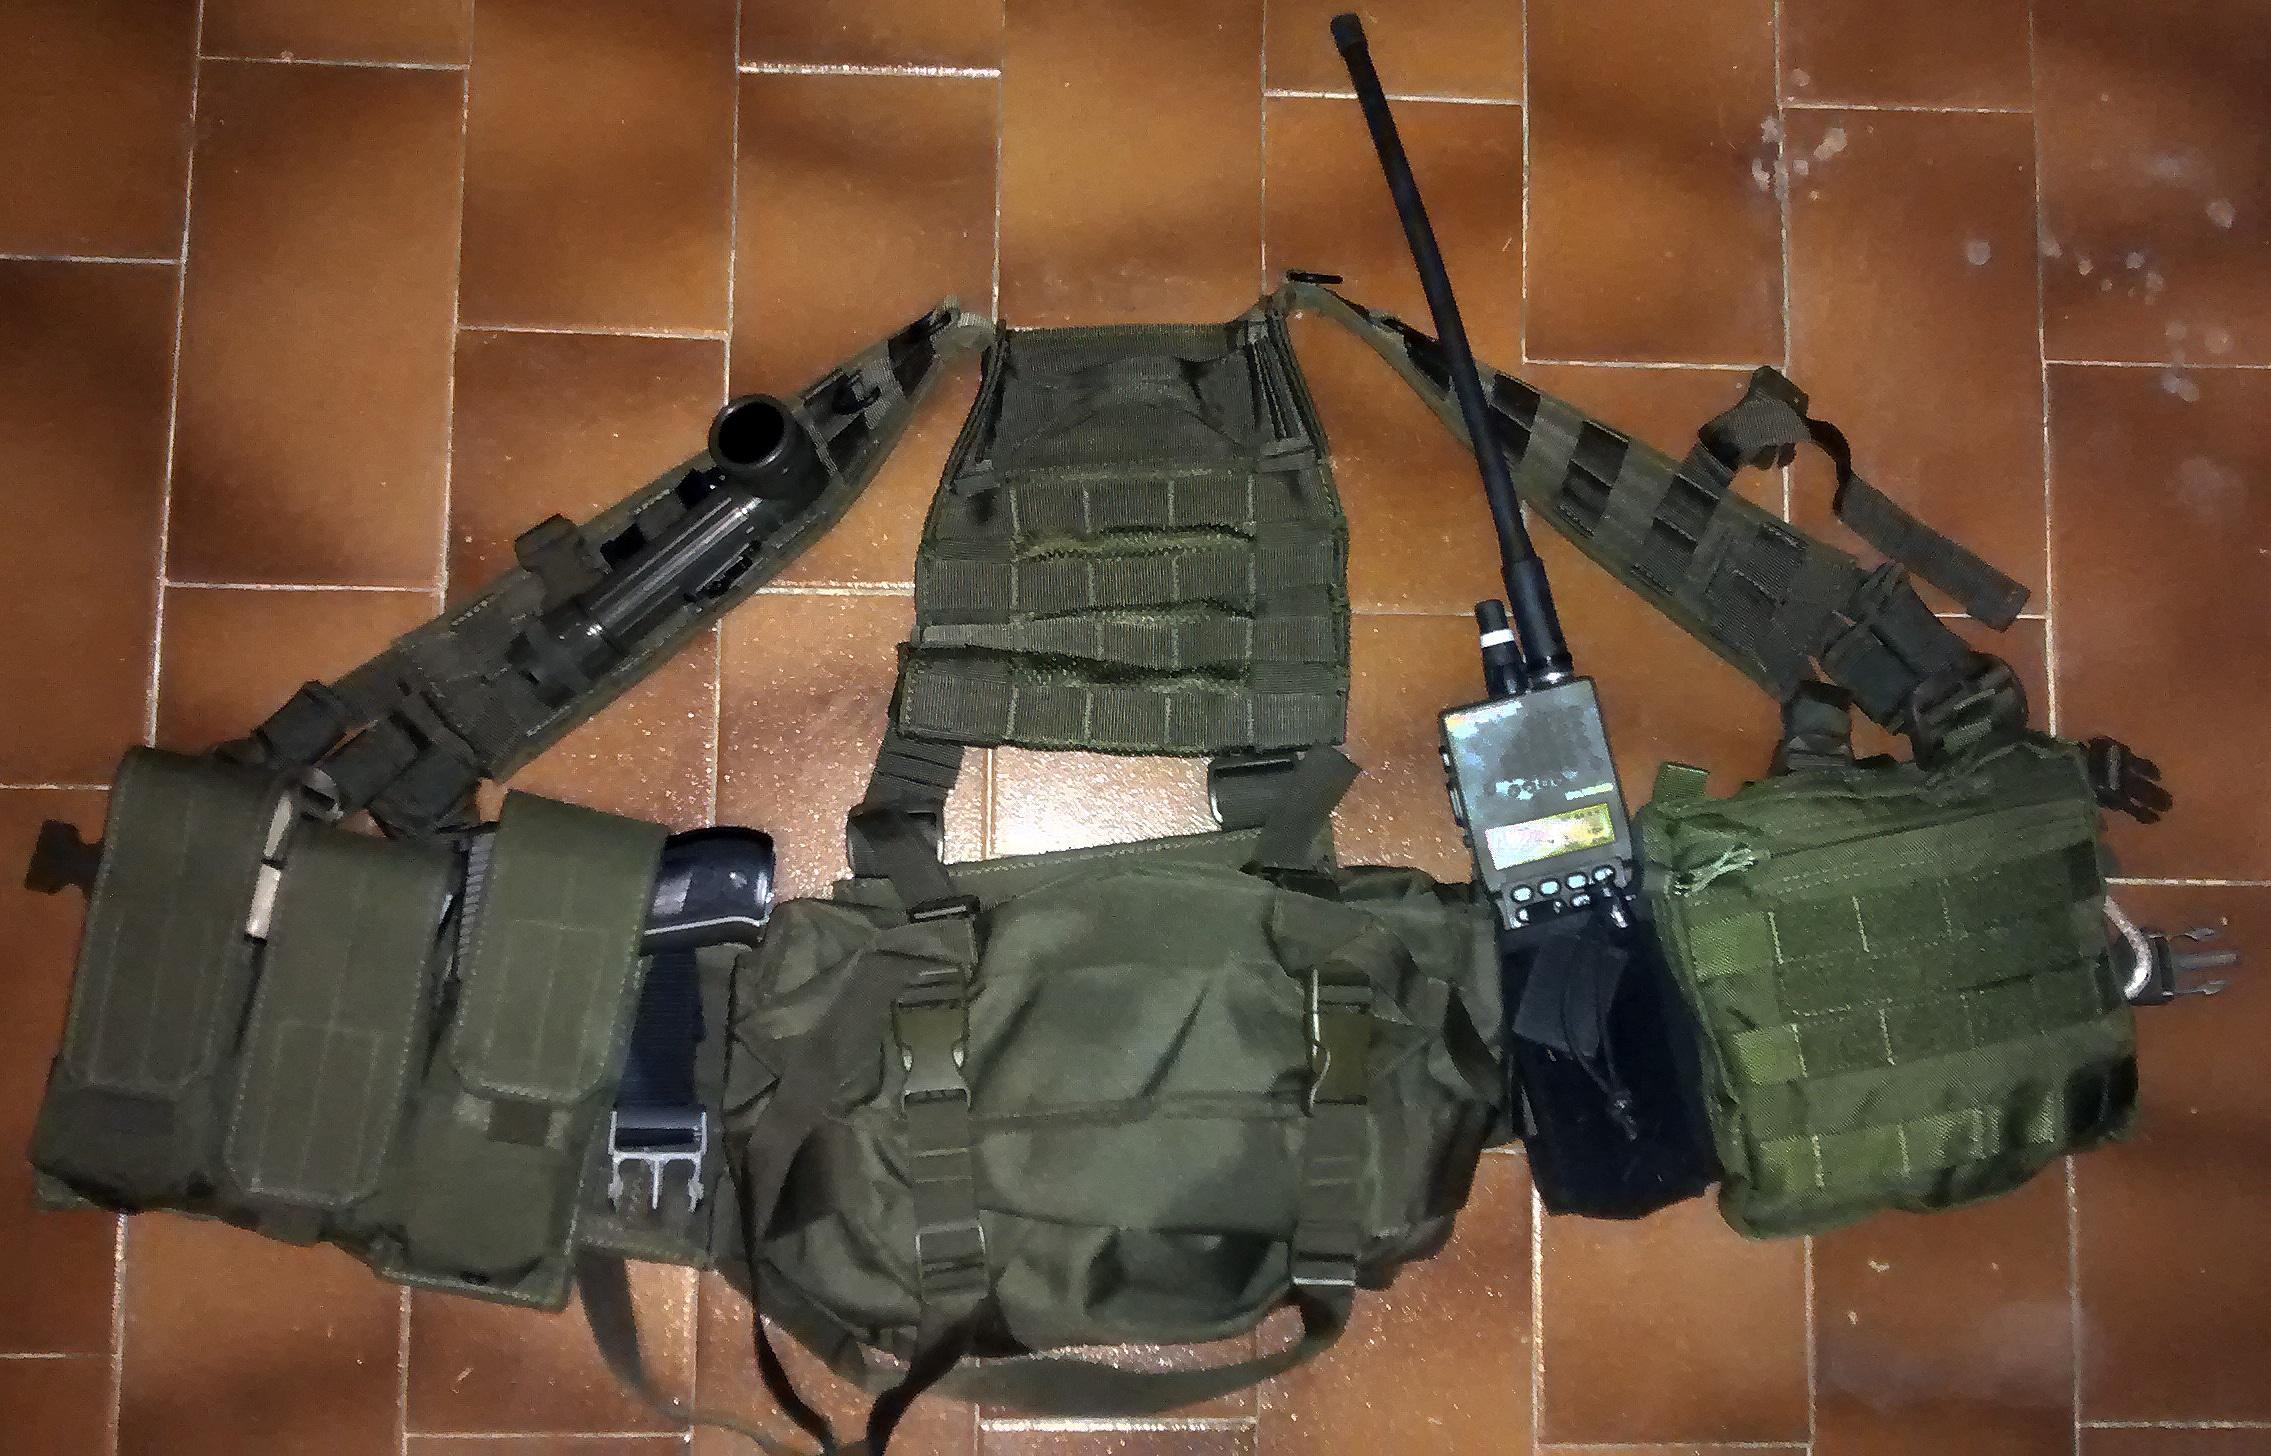 [REVIEW] Chalecos GREENSIDE + comparte tu configuración LBE